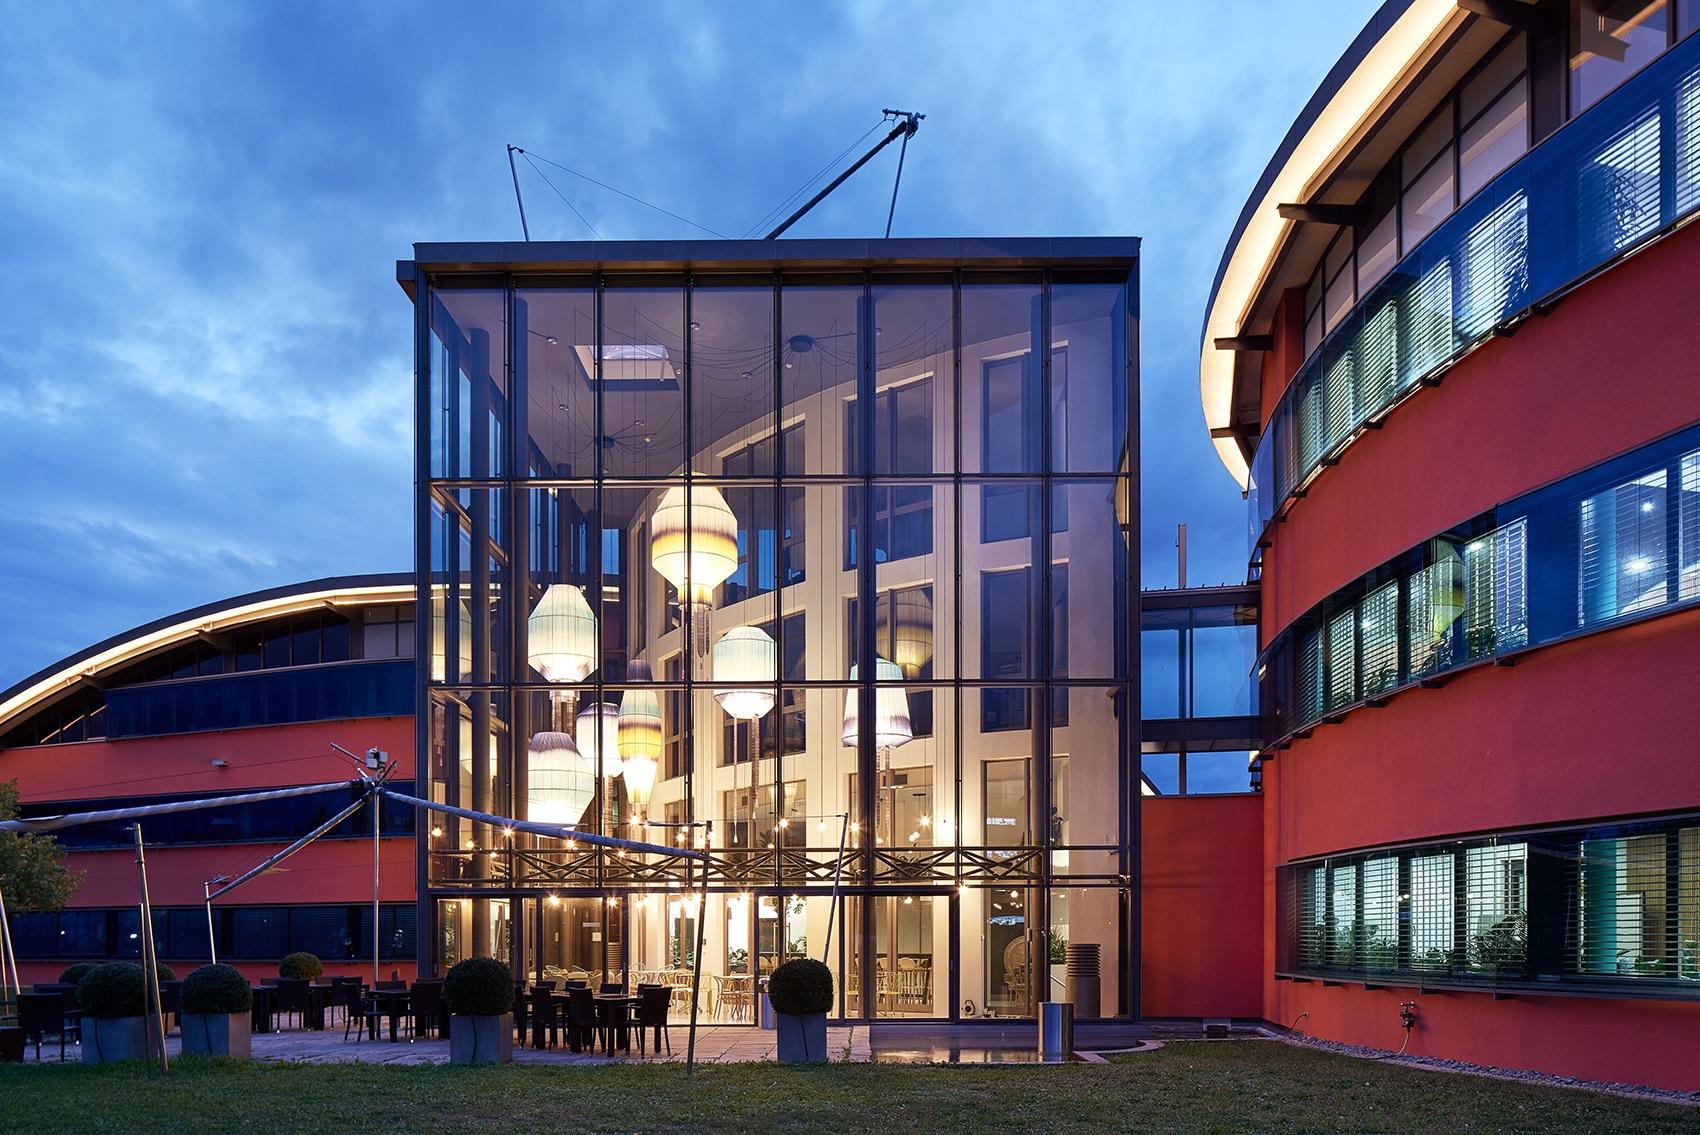 roman-klis-design-office-5